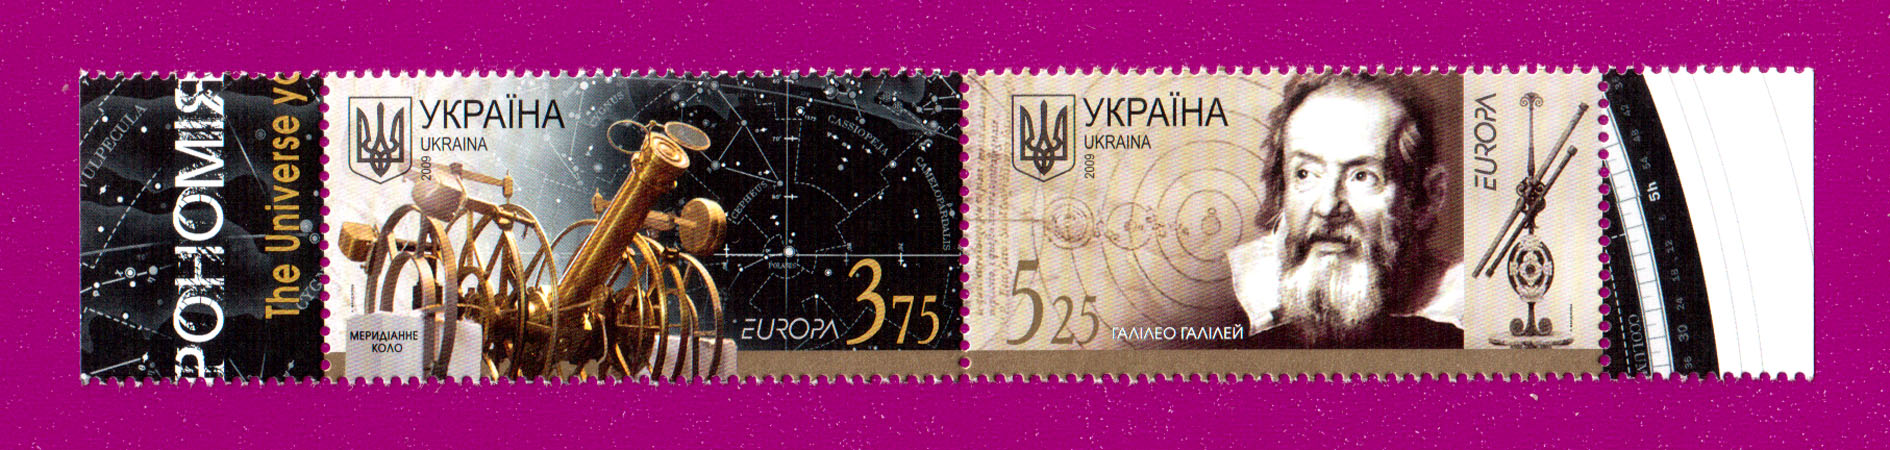 2009 N990-991 сцепка Астрономия Галилео Галилей космос Европа CEPT Украина